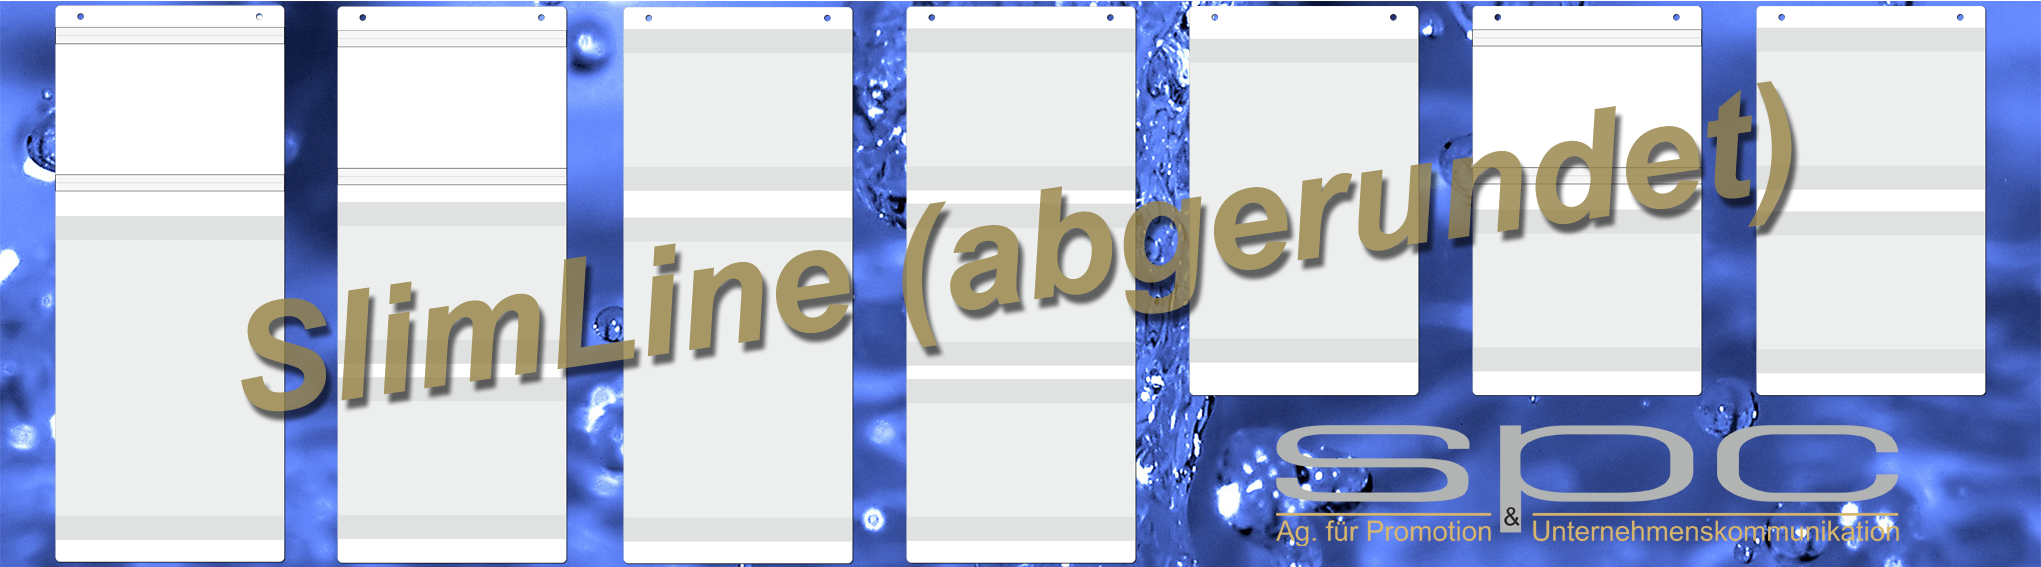 Banner-GS-SlimLine-abgerundet0CtrZDf6KFHT4